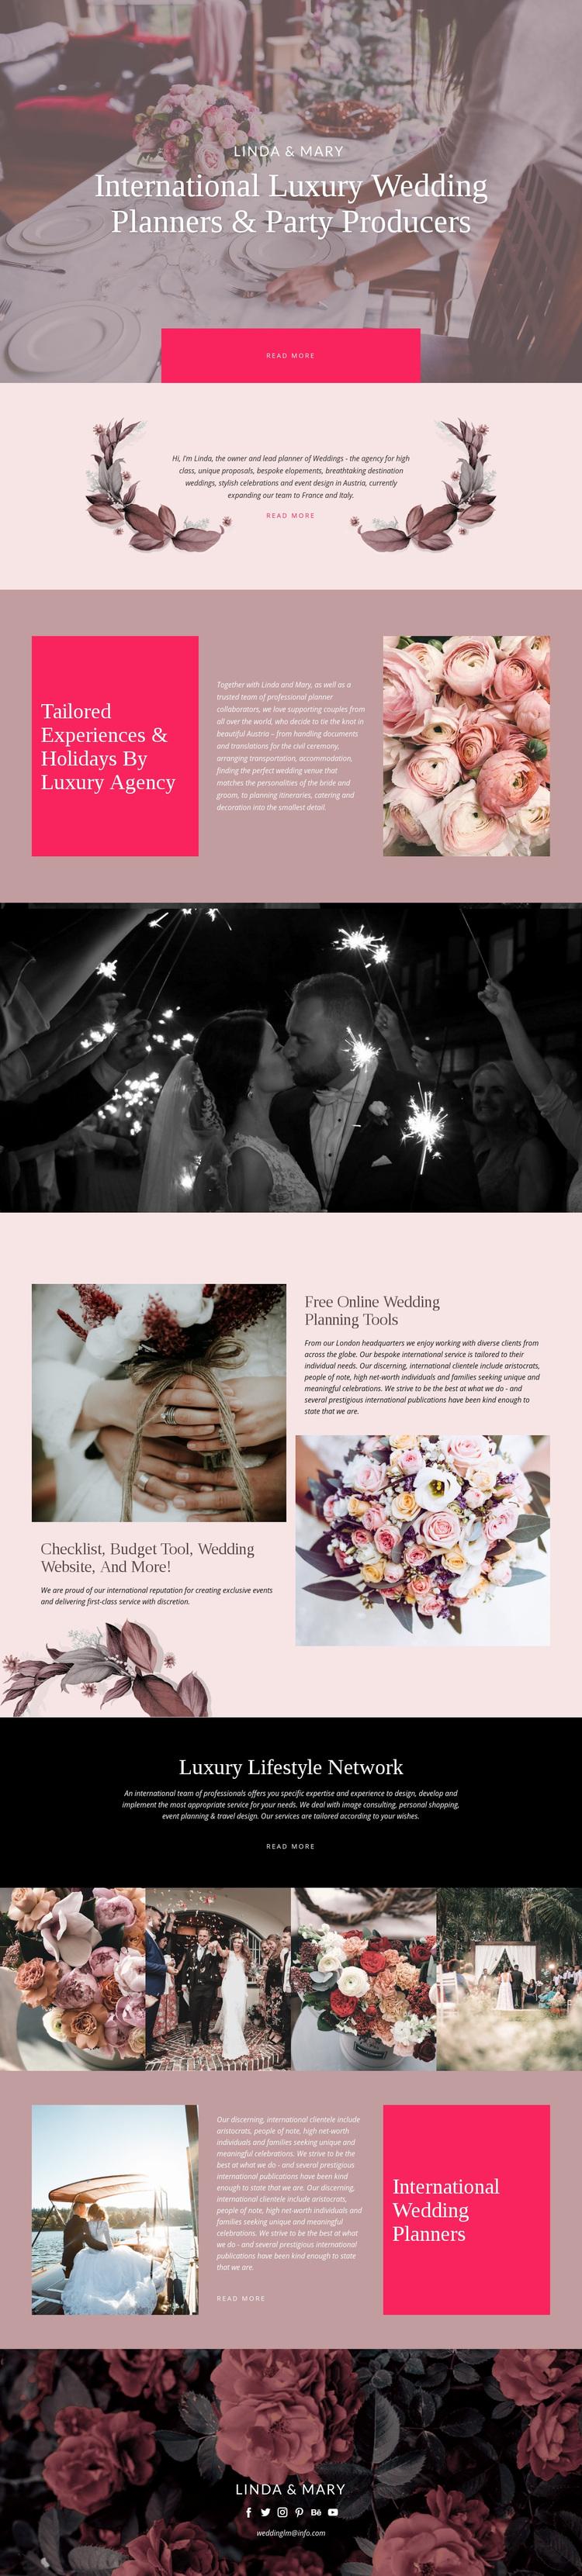 Luxury Wedding Web Page Designer